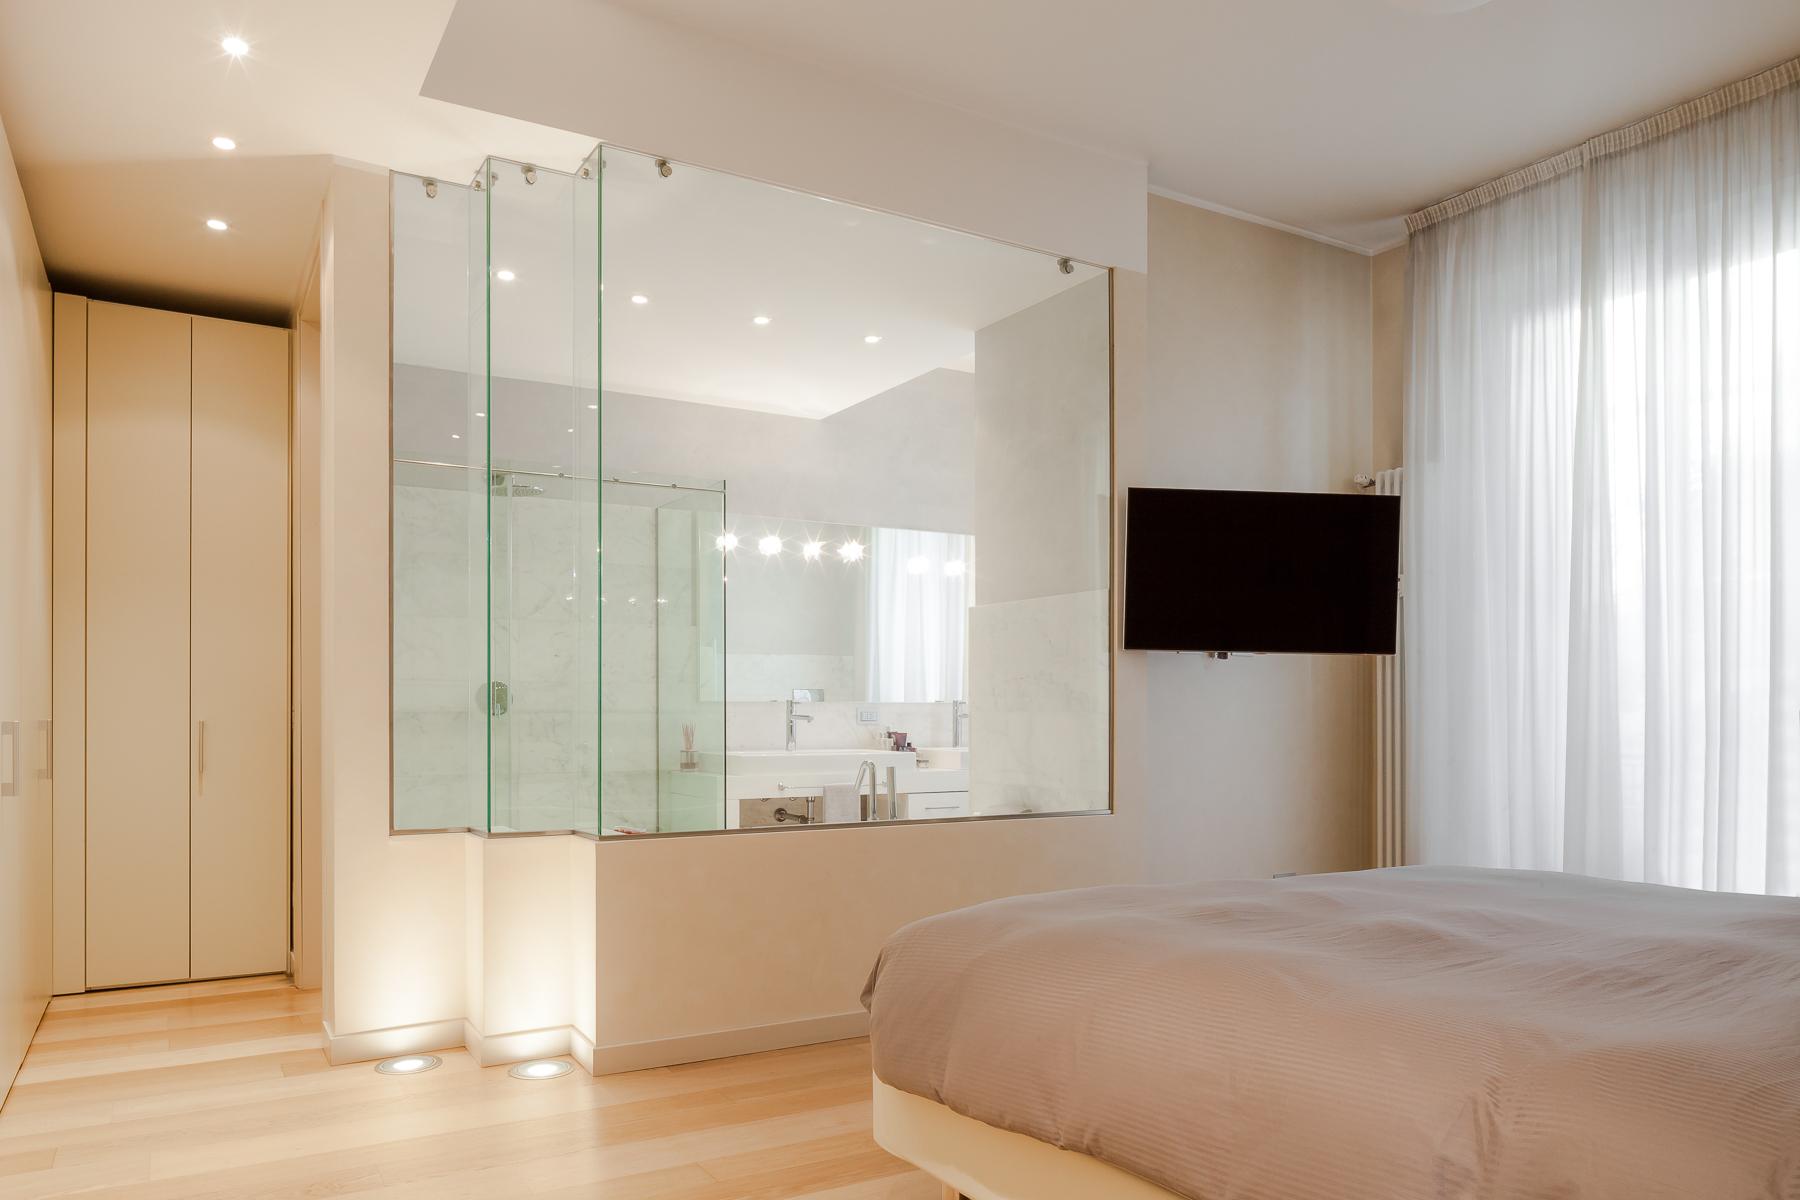 Additional photo for property listing at Elegant apartment in historic Palazzo Corso Venezia Milano, Milan 20121 Italia